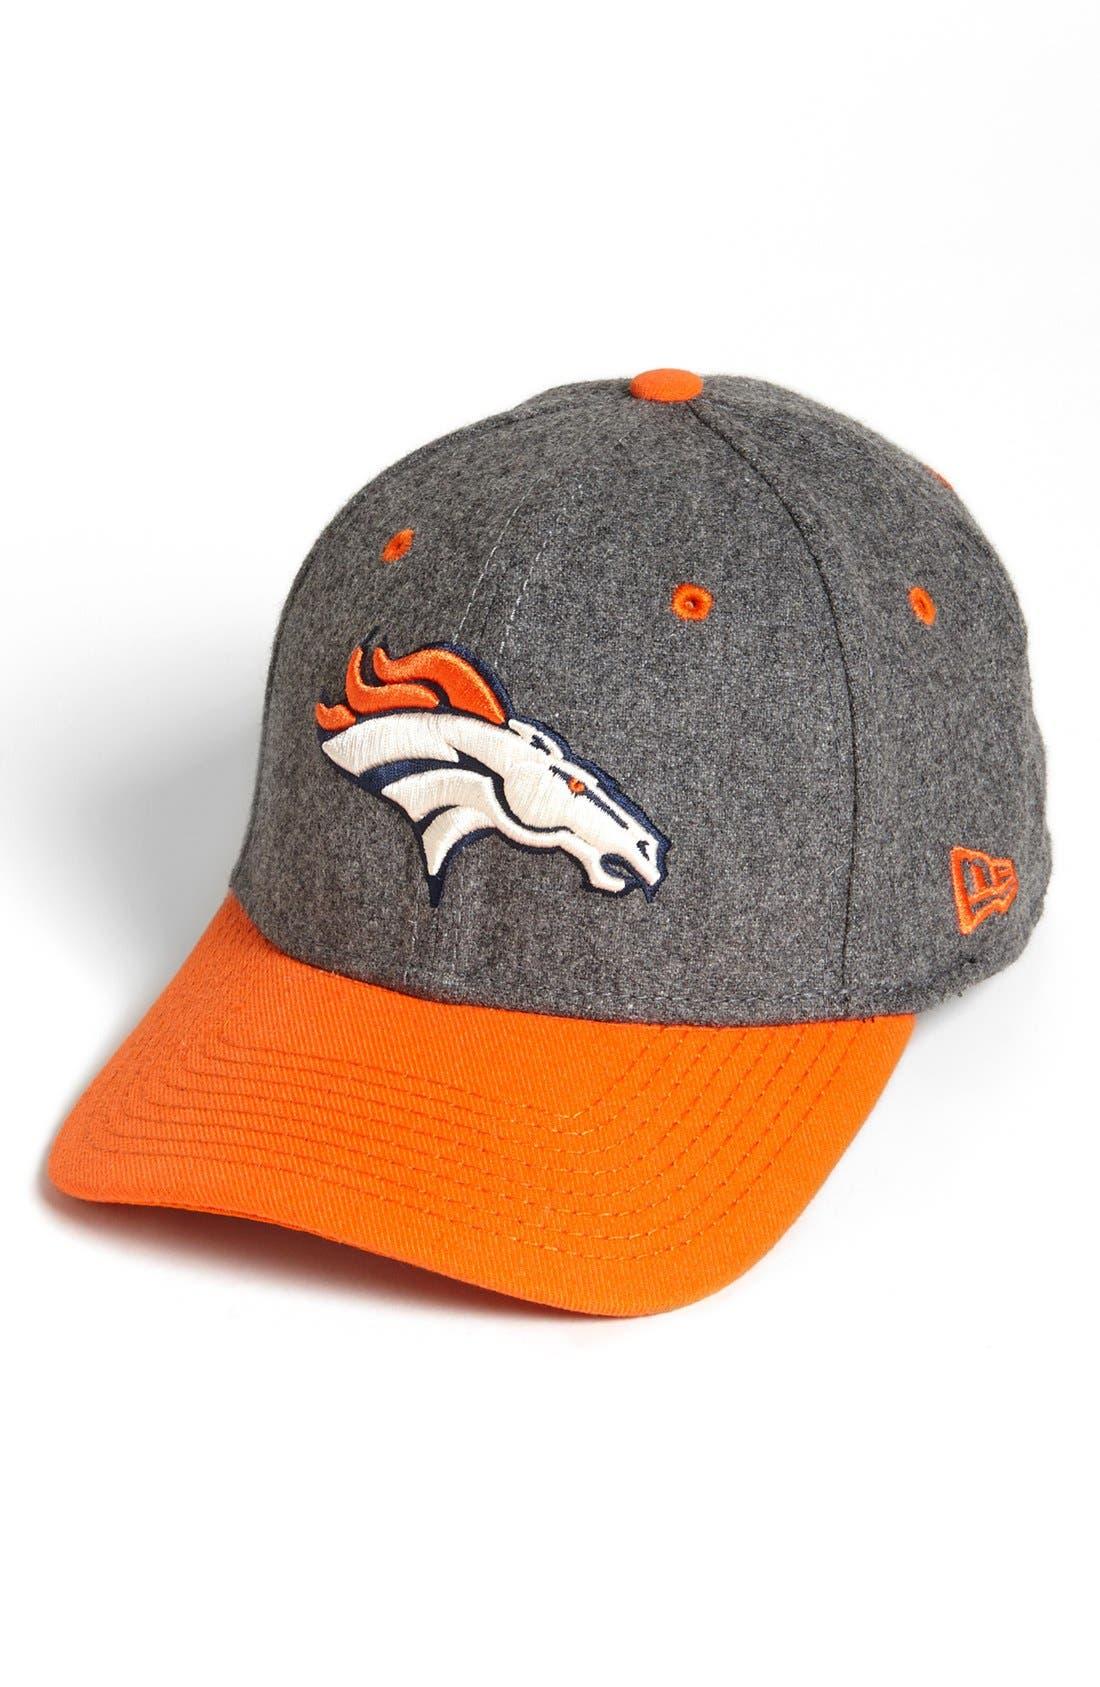 Main Image - New Era Cap 'Meltop - Denver Broncos' Fitted Baseball Cap